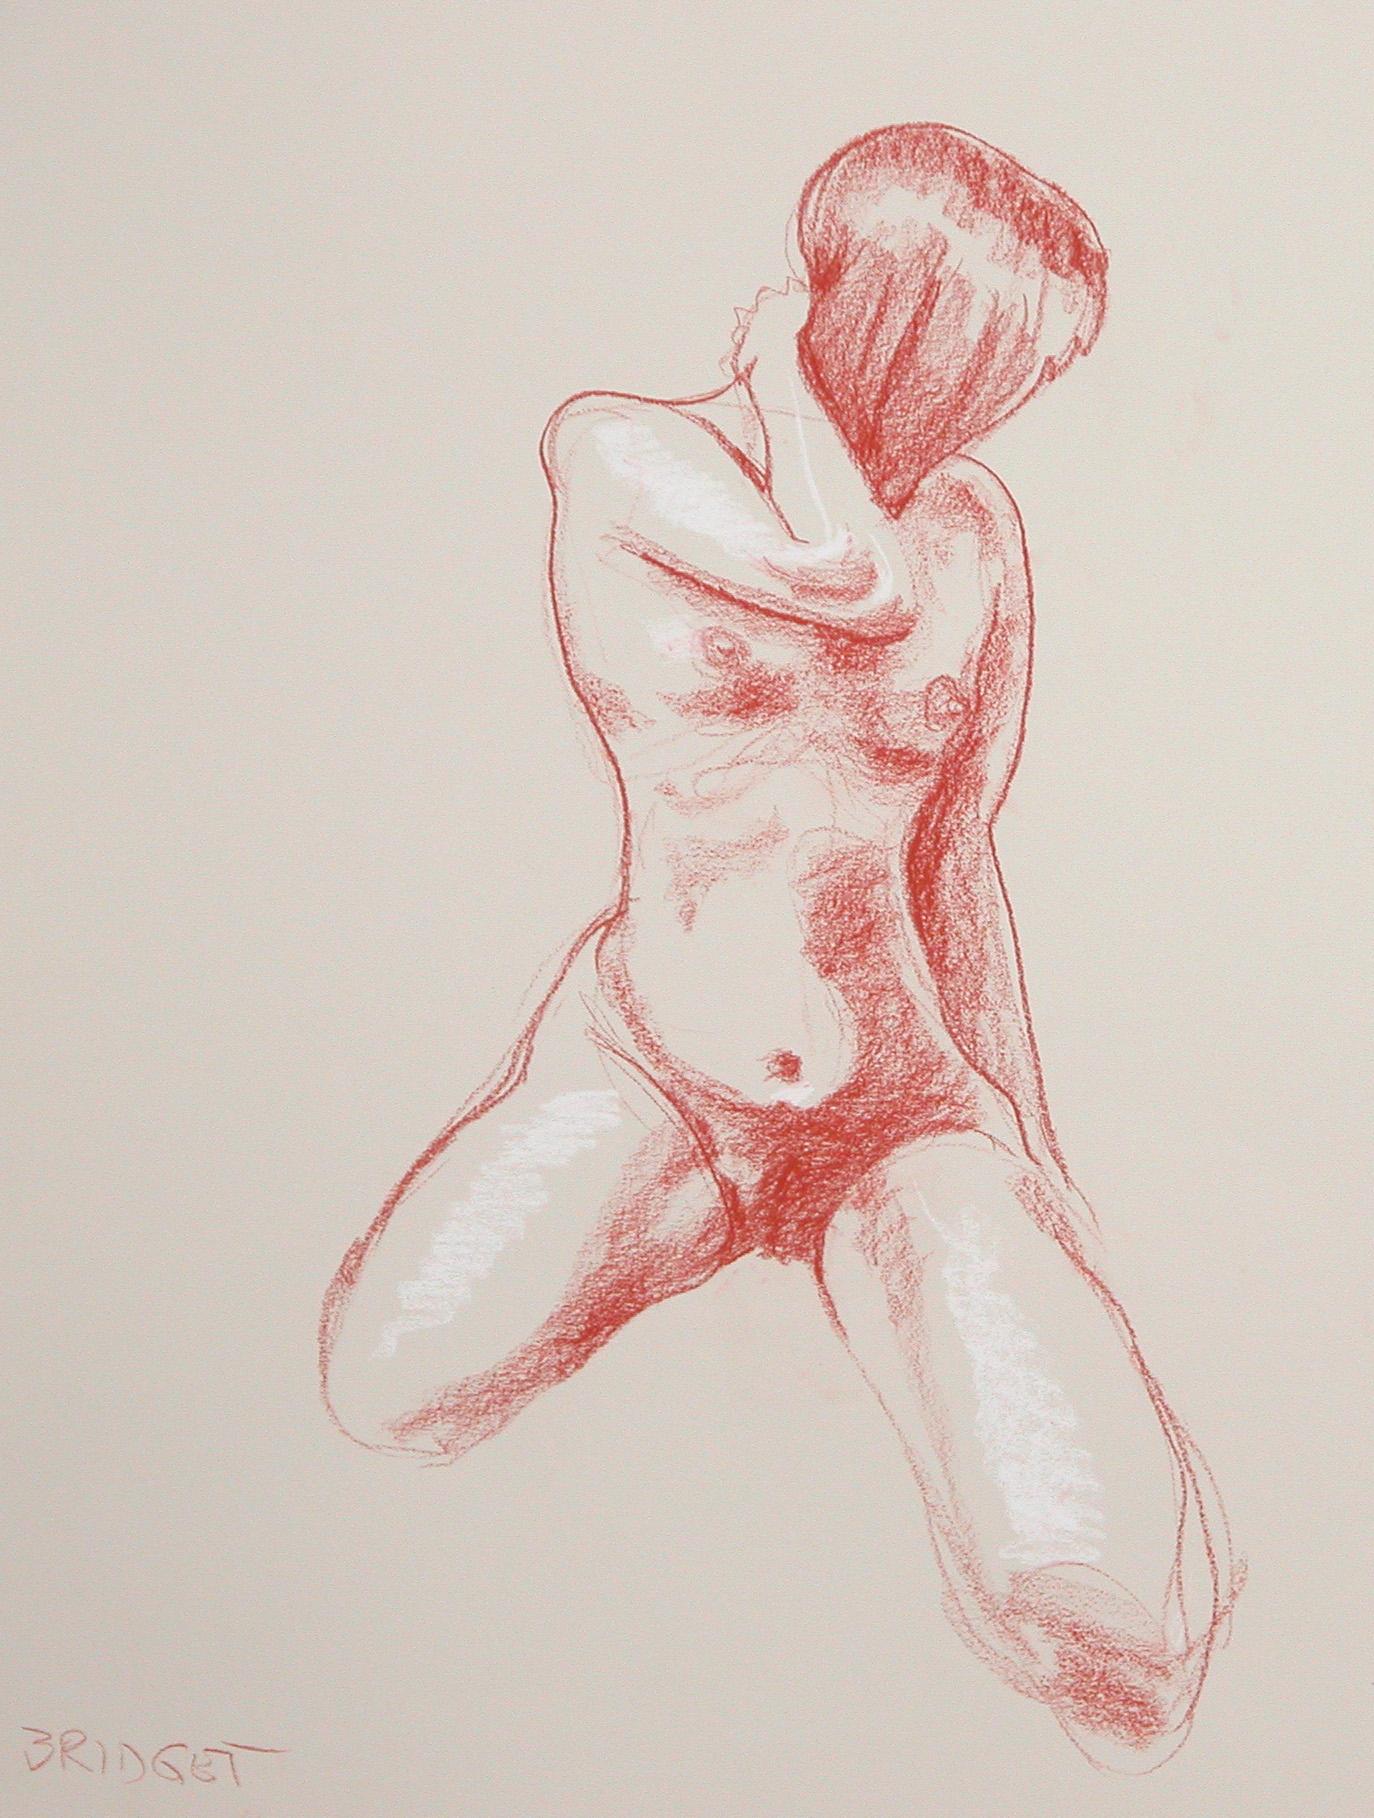 Girl drawn with Conte crayon